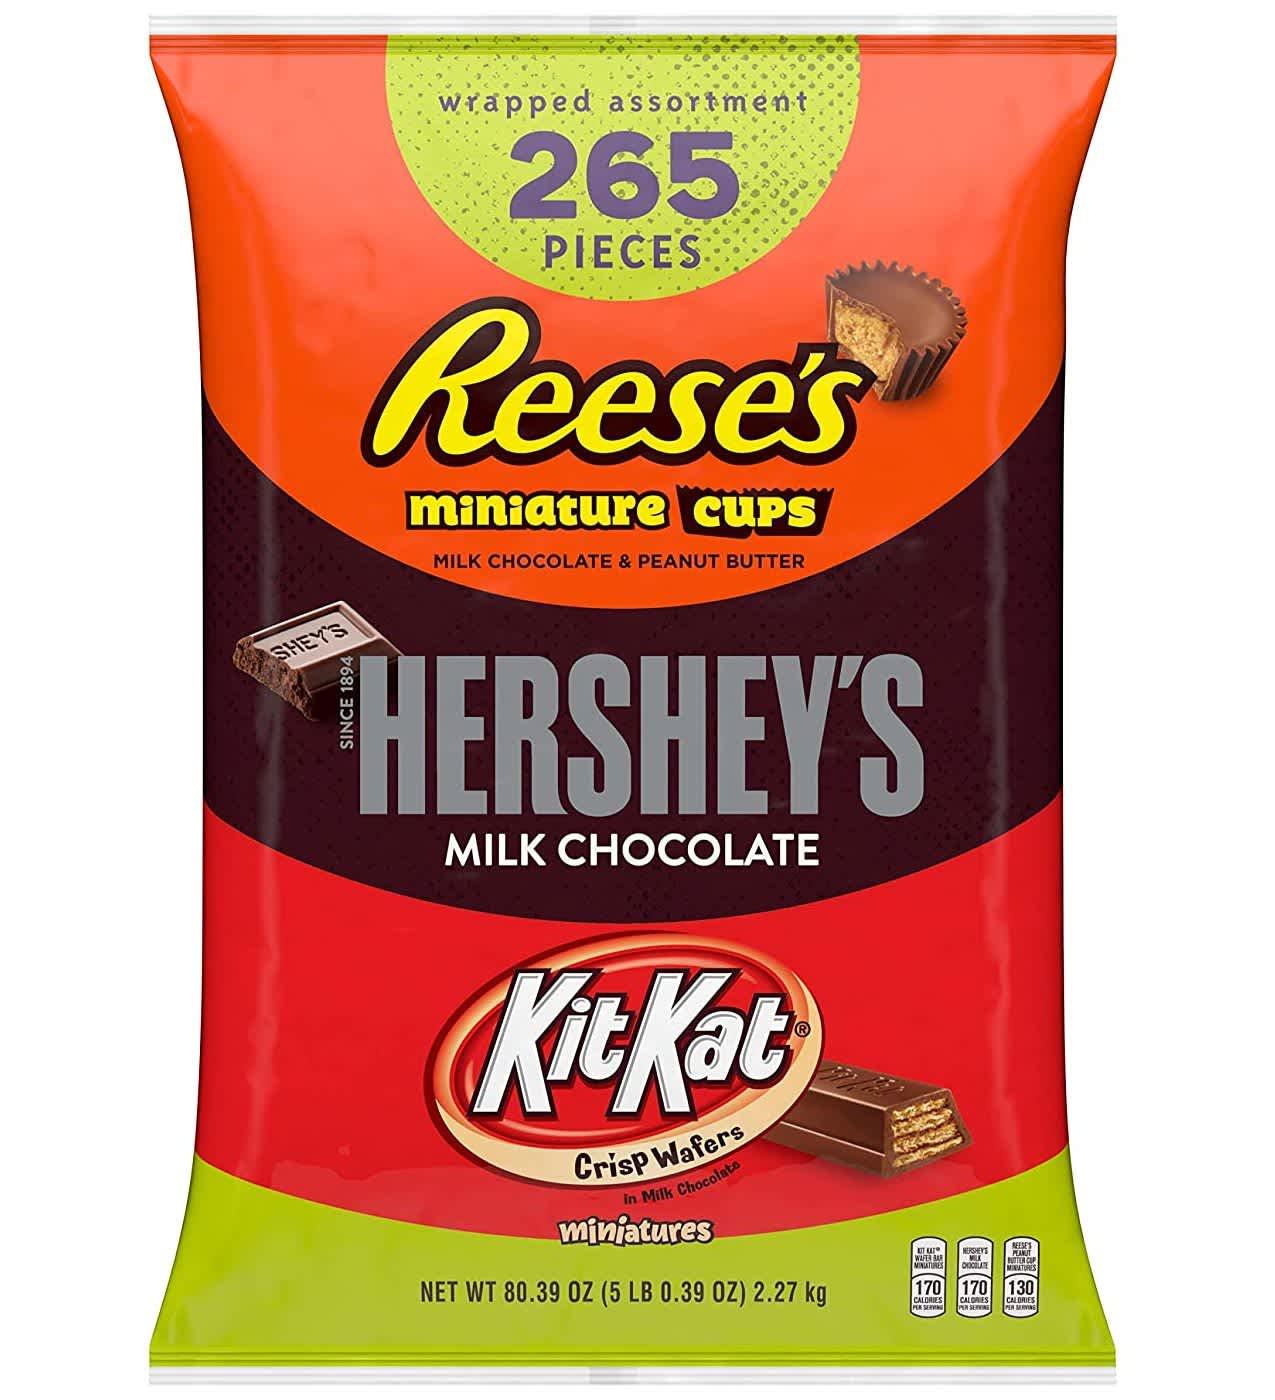 Hershey's, Kit Kat, Reese's 5-lb. Variety Pack